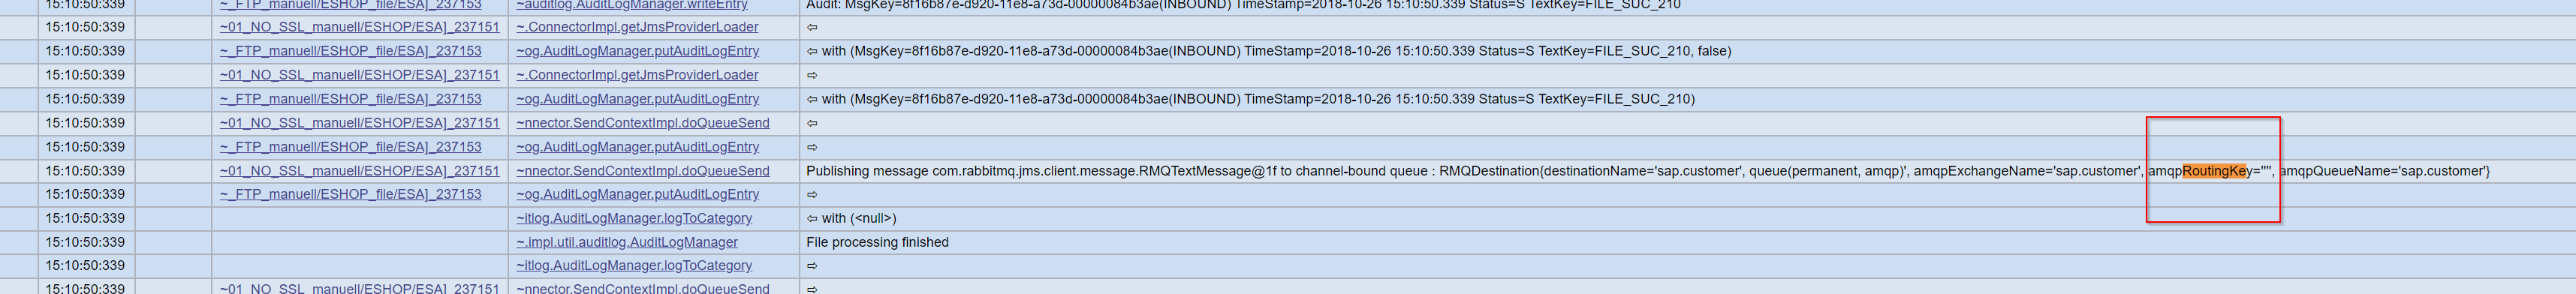 Integration of SAP PI/PO with RabbitMQ AMQP Broker via JMS